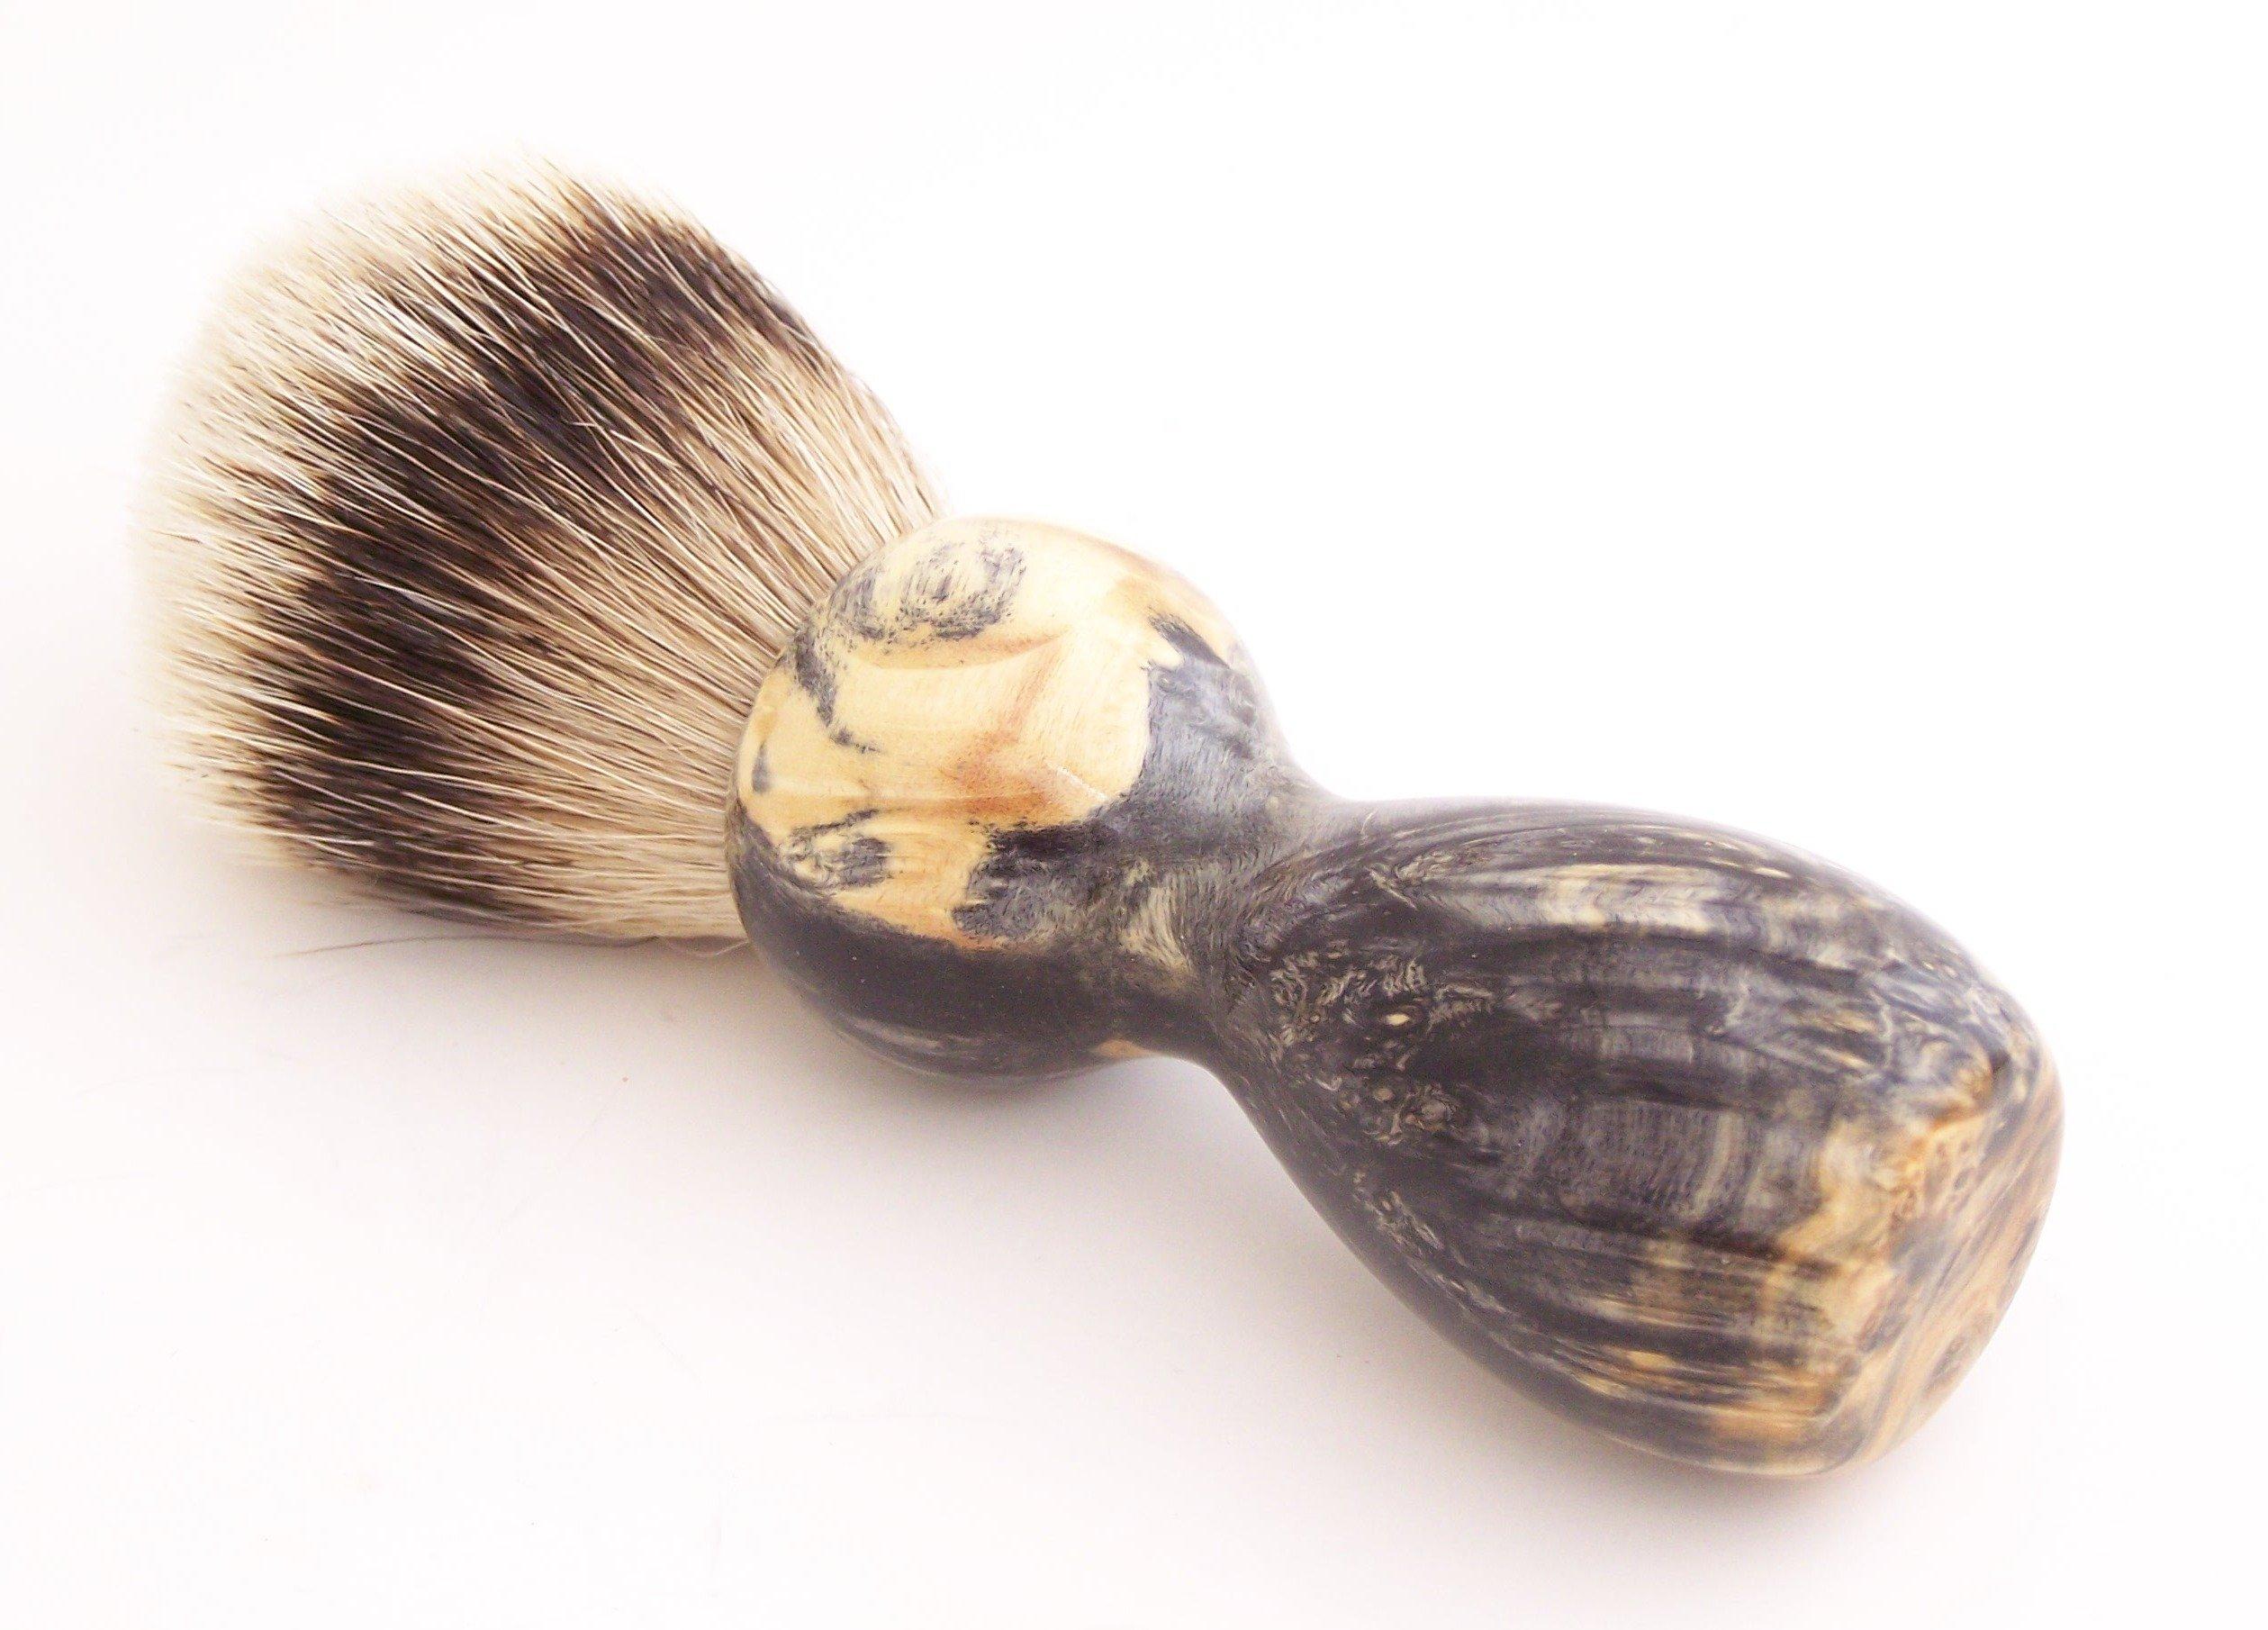 Black Box Elder Burl Wood 22mm Super Silvertip Shaving Brush (BEB30)